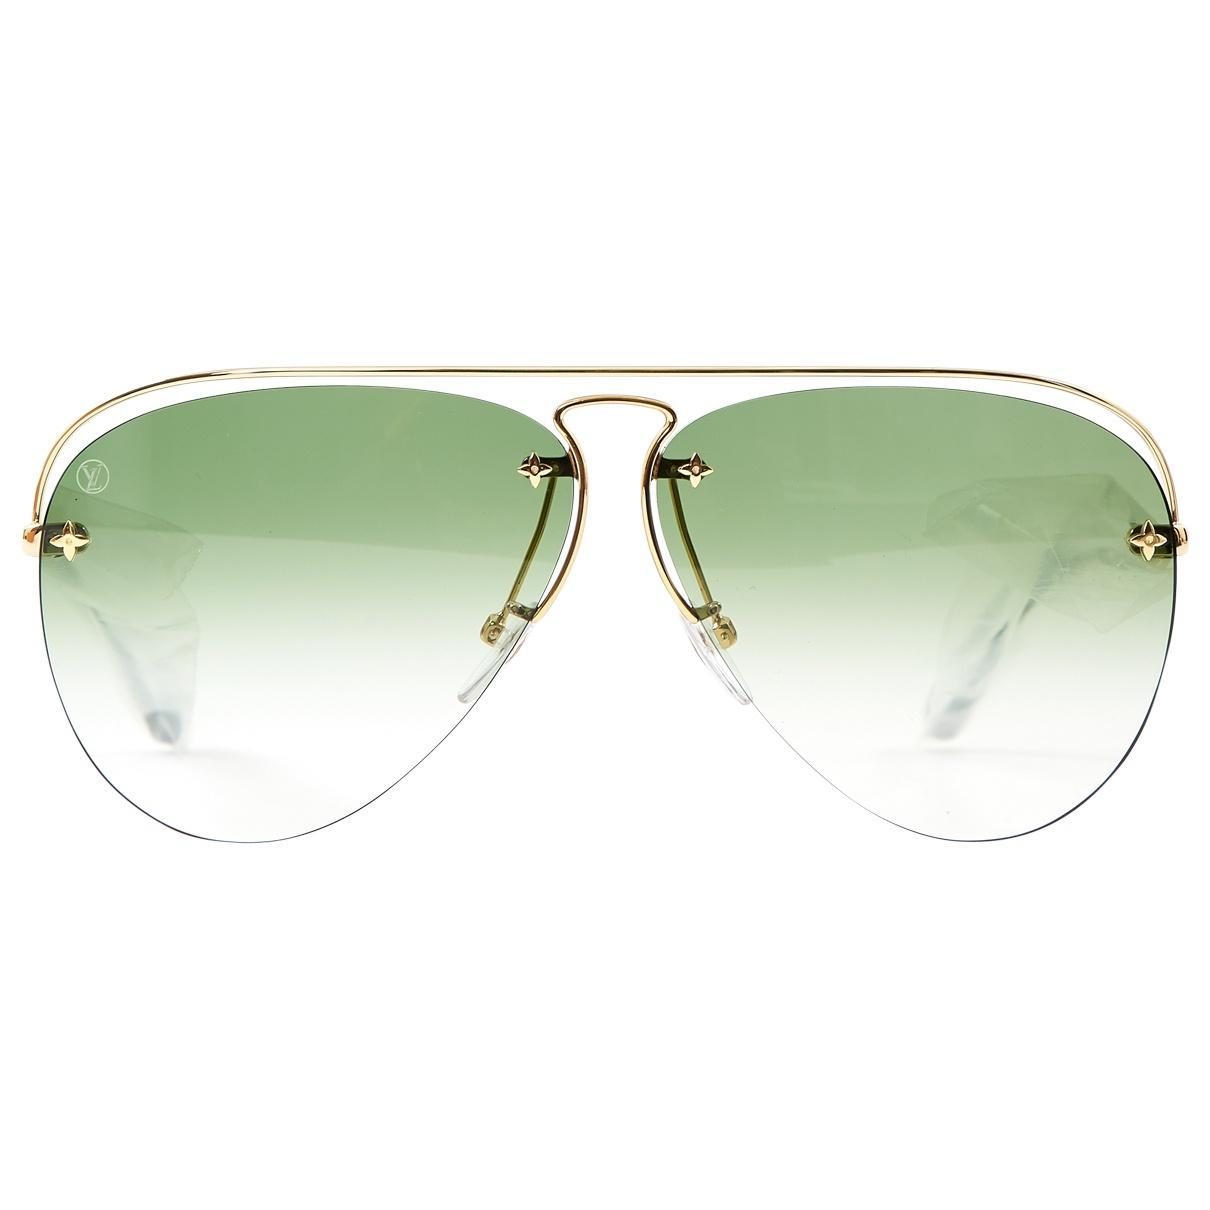 e895618627 Louis Vuitton Aviator Sunglasses in Green - Lyst